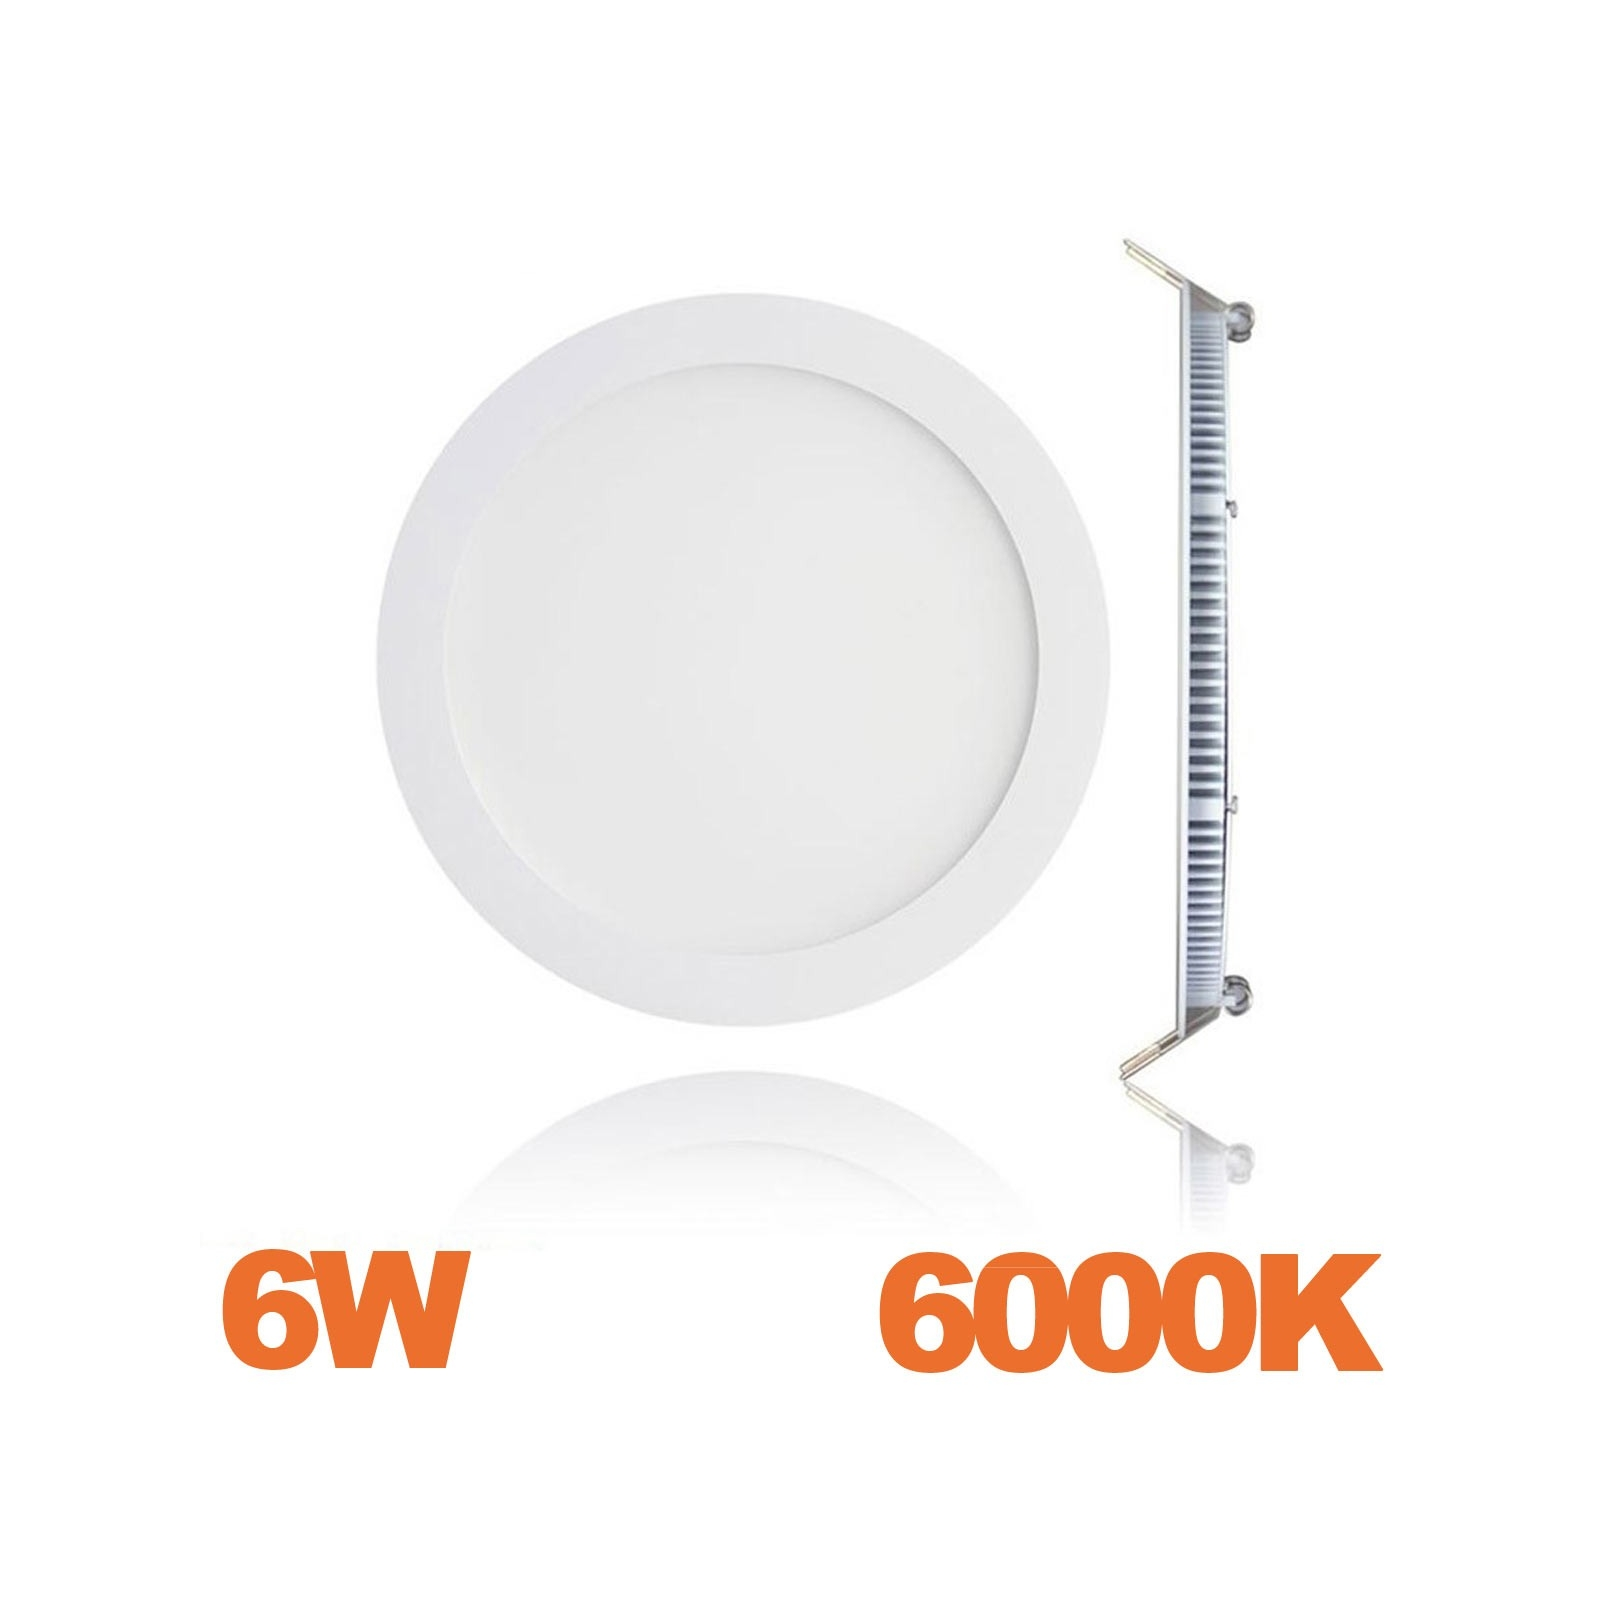 Spot Encastrable LED Downlight Panel Extra-Plat 6W Blanc Froid 6000k